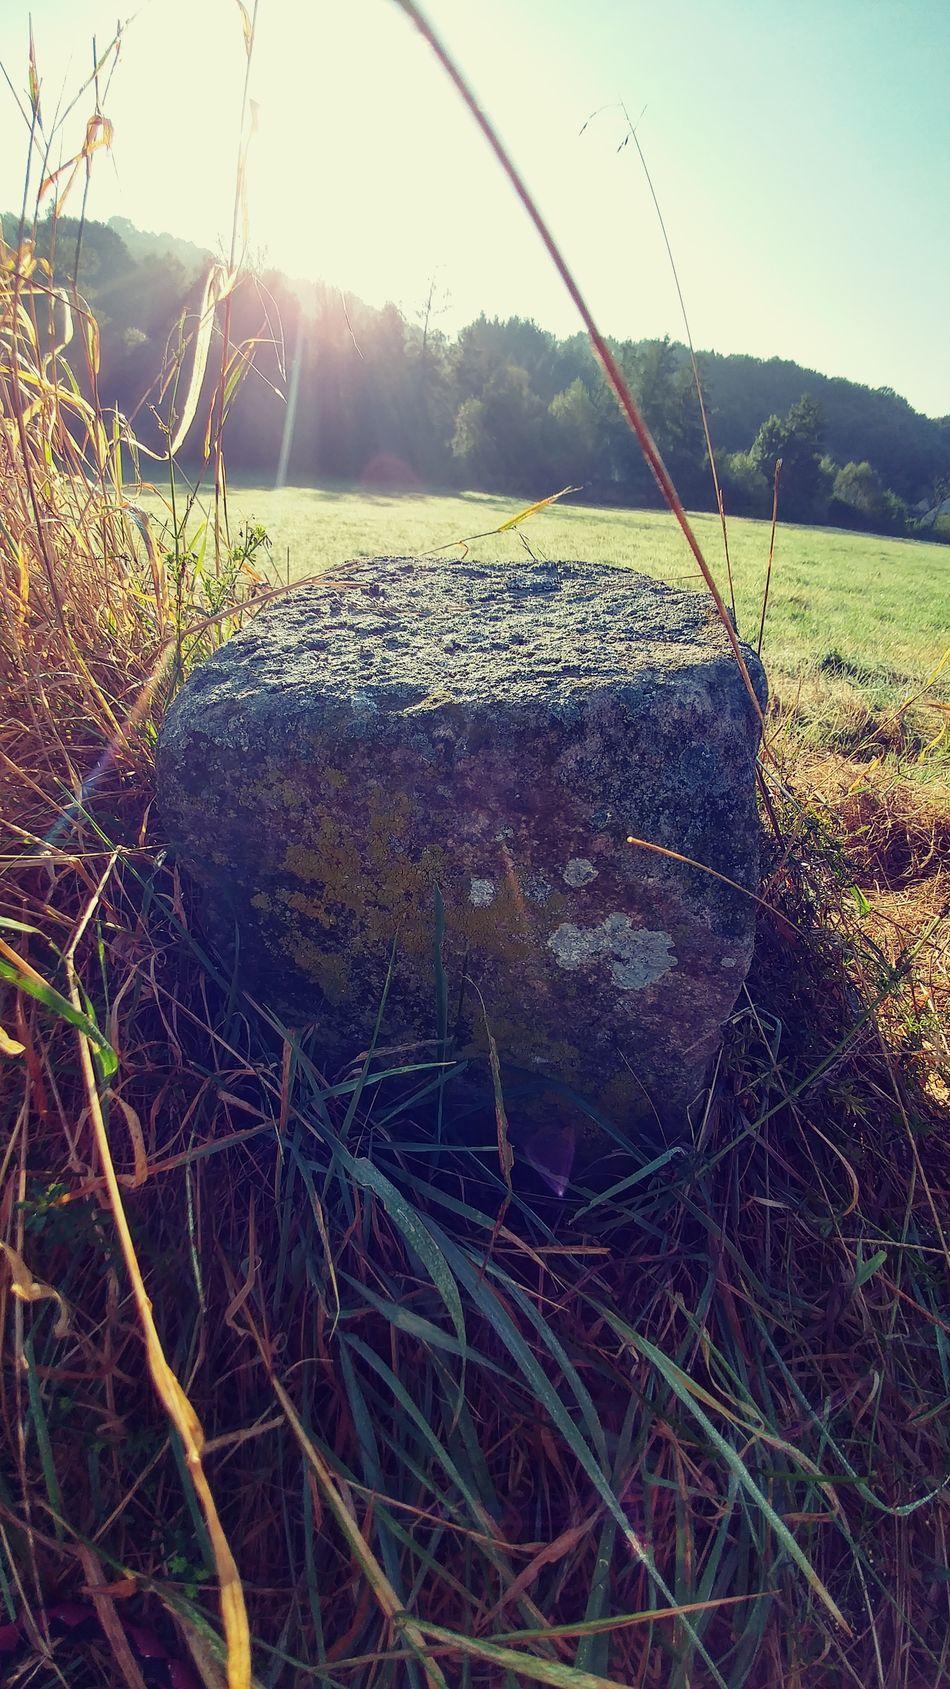 Grass Trawa Nature Natura Stones Kamienie Smartphone Photography Smartphonephotography Lgg5photography LG  Lg G5